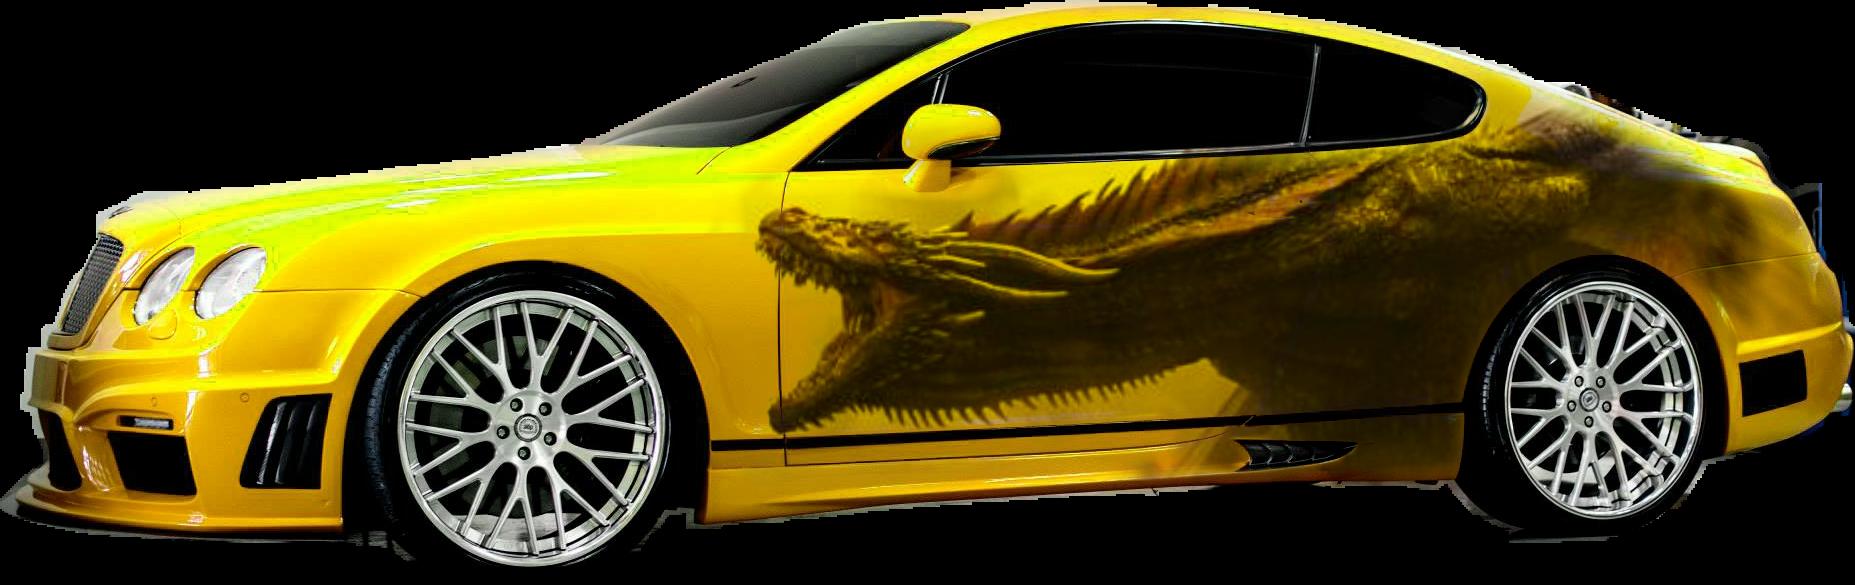 ##GAMEOFTHRONES #car #tuningcar #freetoedit